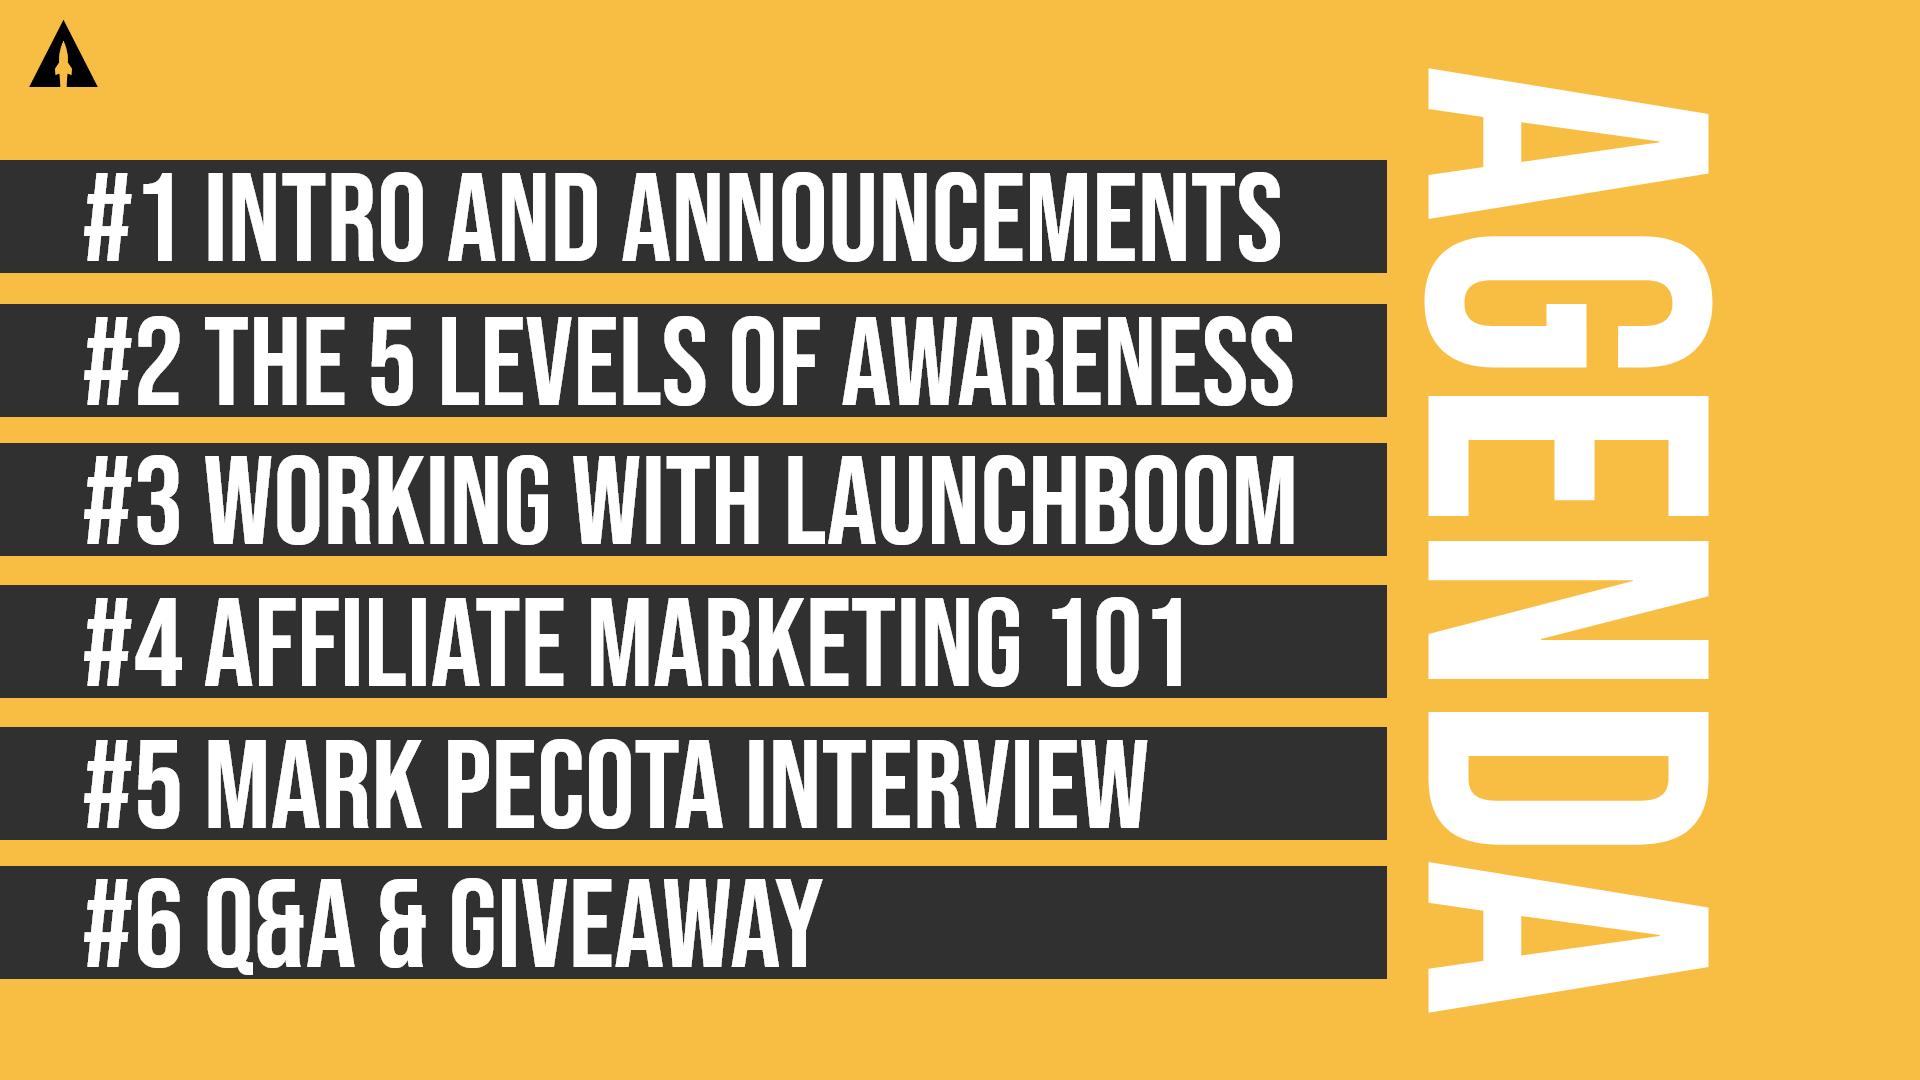 LaunchBoom Live Recap: Customer awareness, affiliate marketing, and an interview